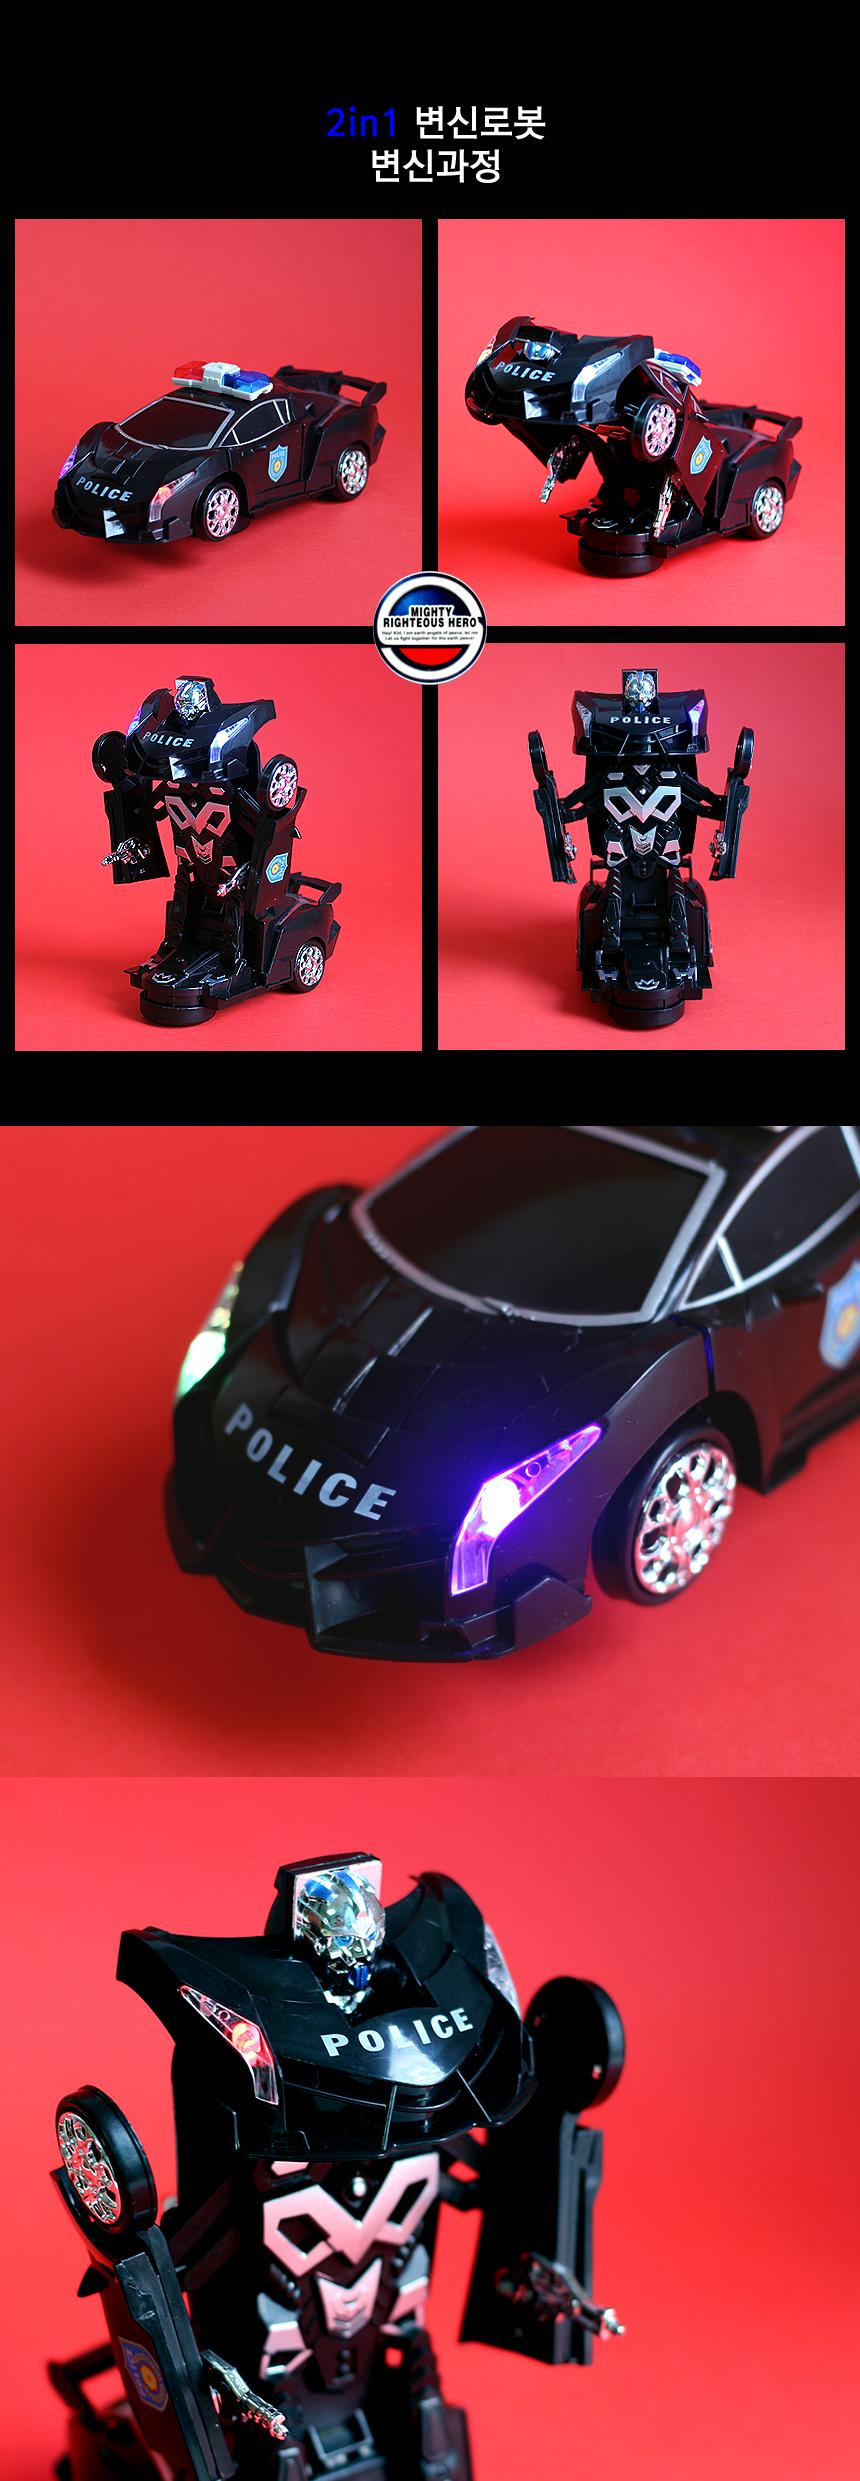 black_poilcecar_02.jpg